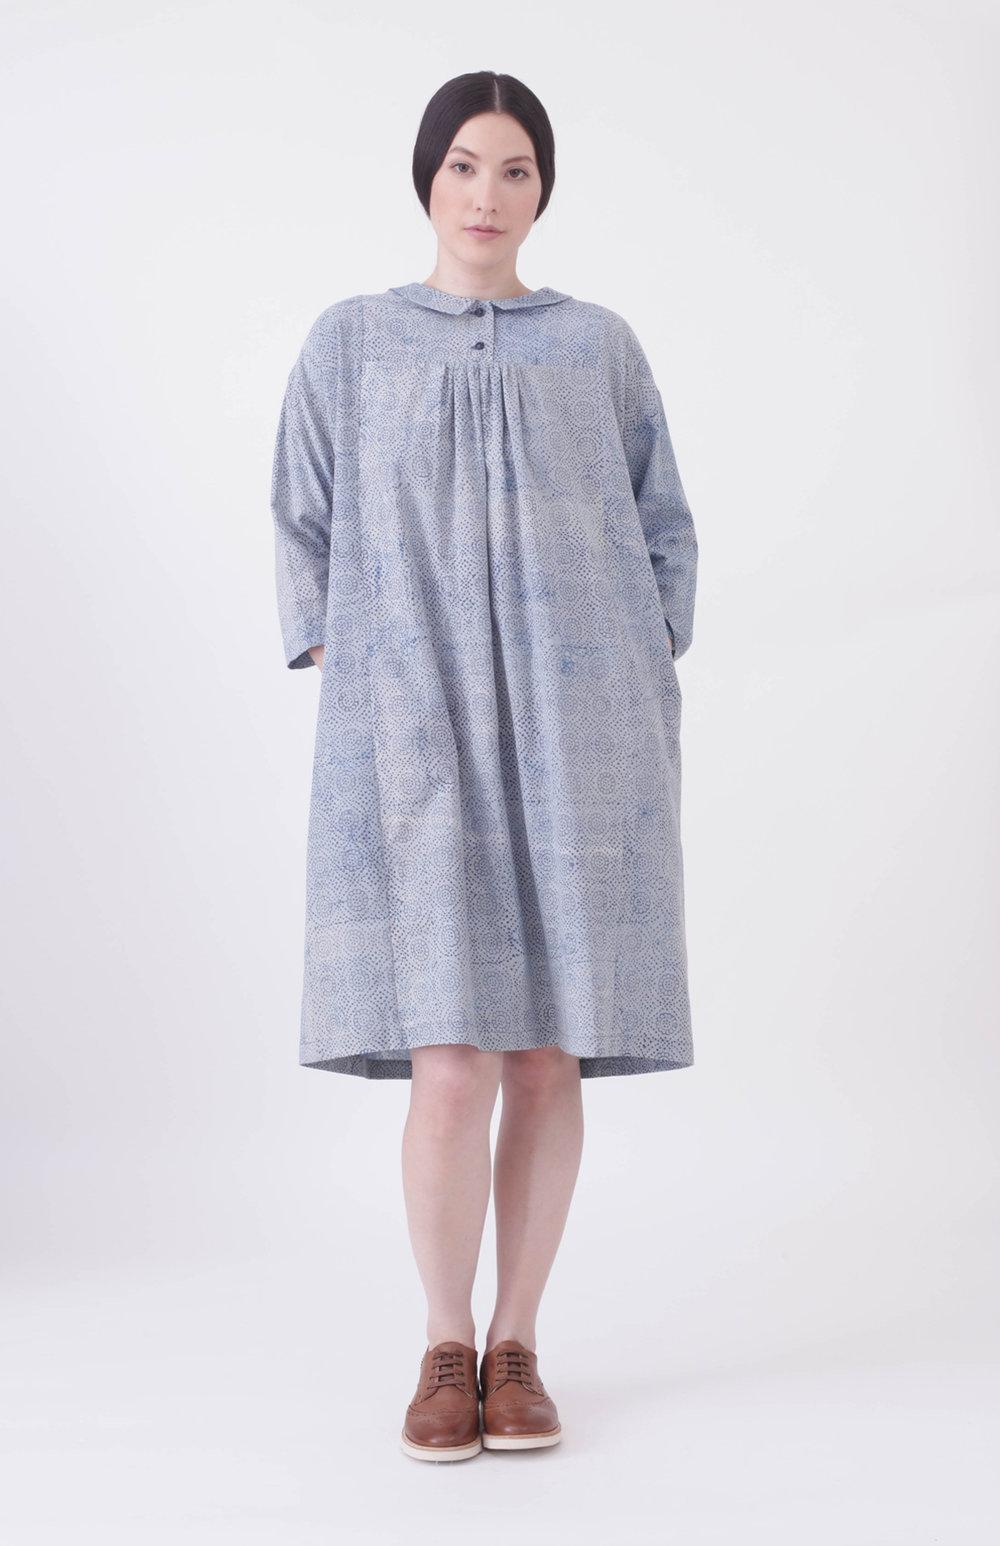 Block print dress dress - 100% Cotton